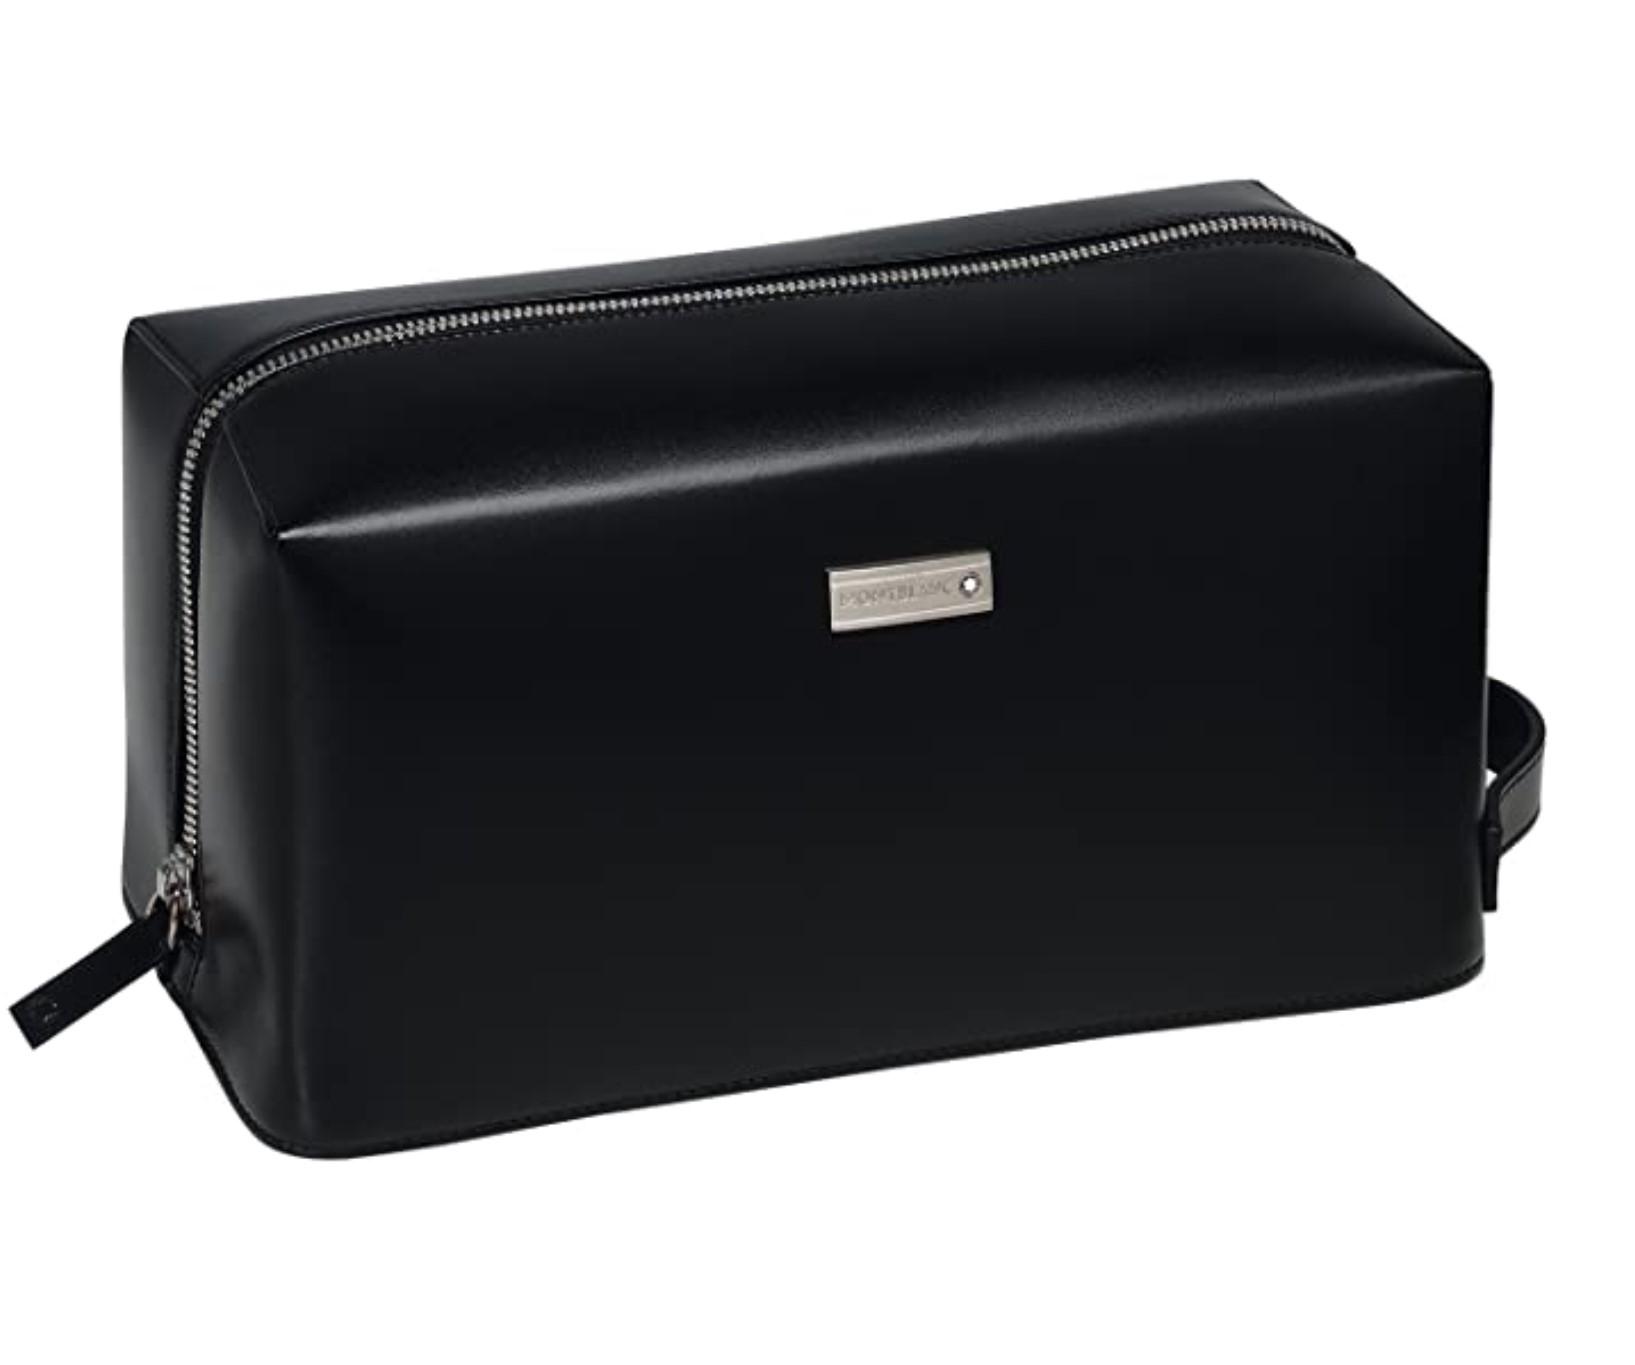 Montblanc 101875 Toiletry Bag